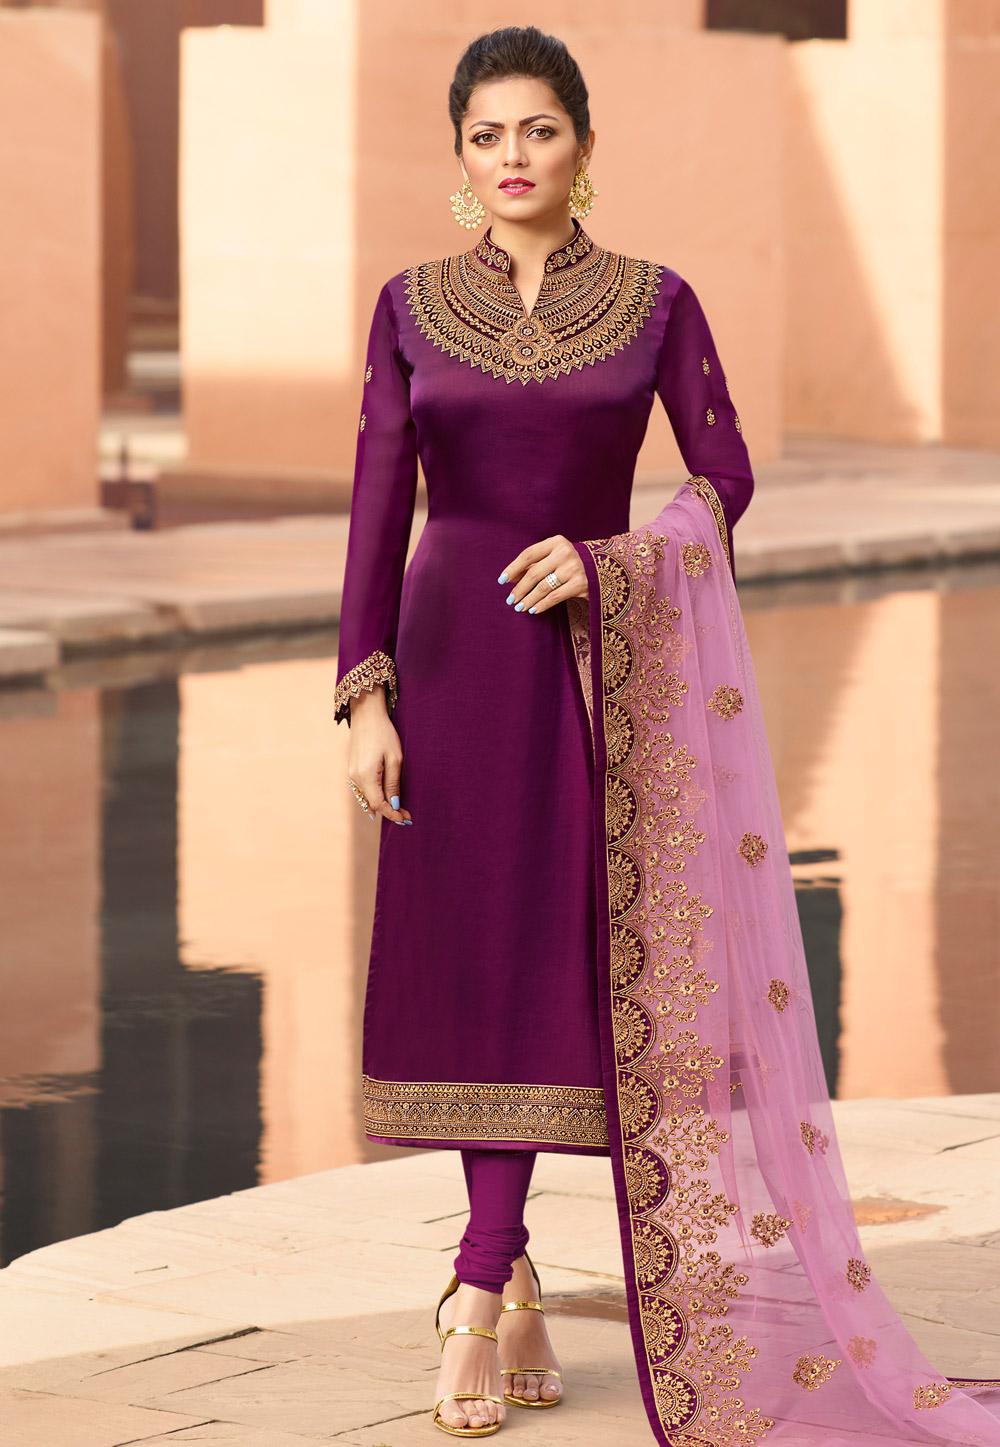 Details about  /SALWAR INDIAN PAKISTANI BOLLYWOOD DESIGNER SALWAR SUIT PART WEAR ETHICAL WOMEN